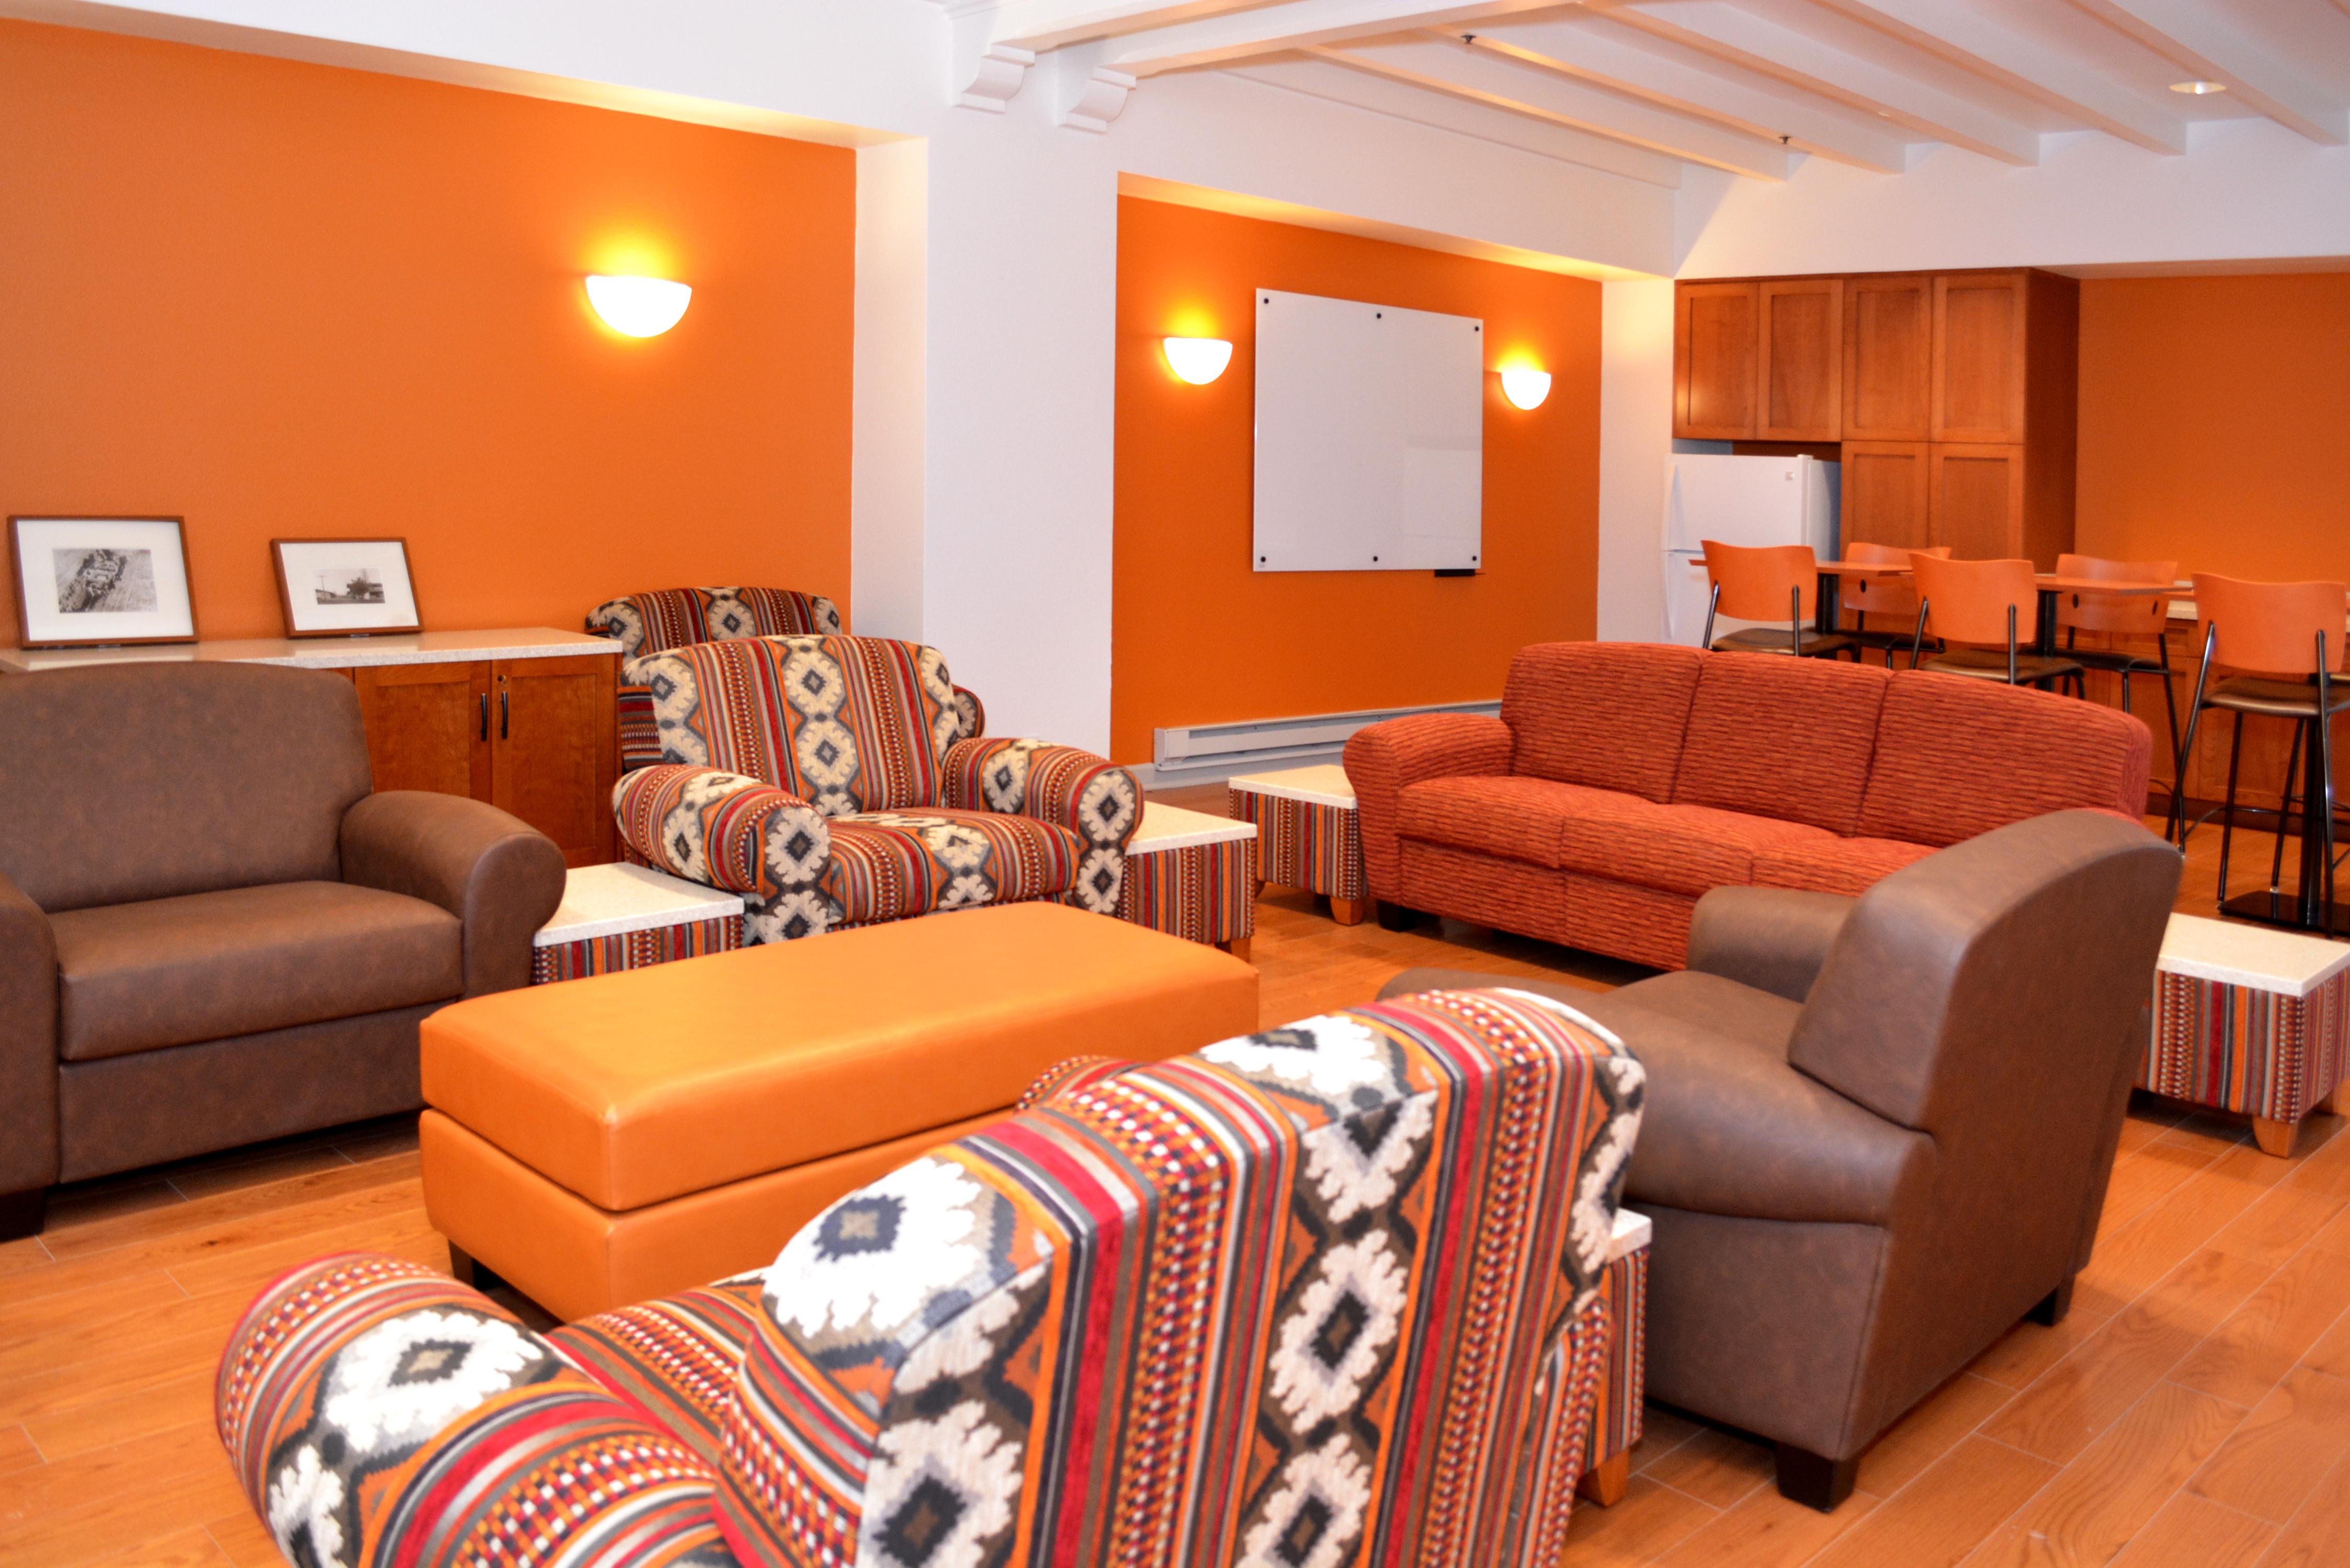 Fairclough Lounge Area at Rains